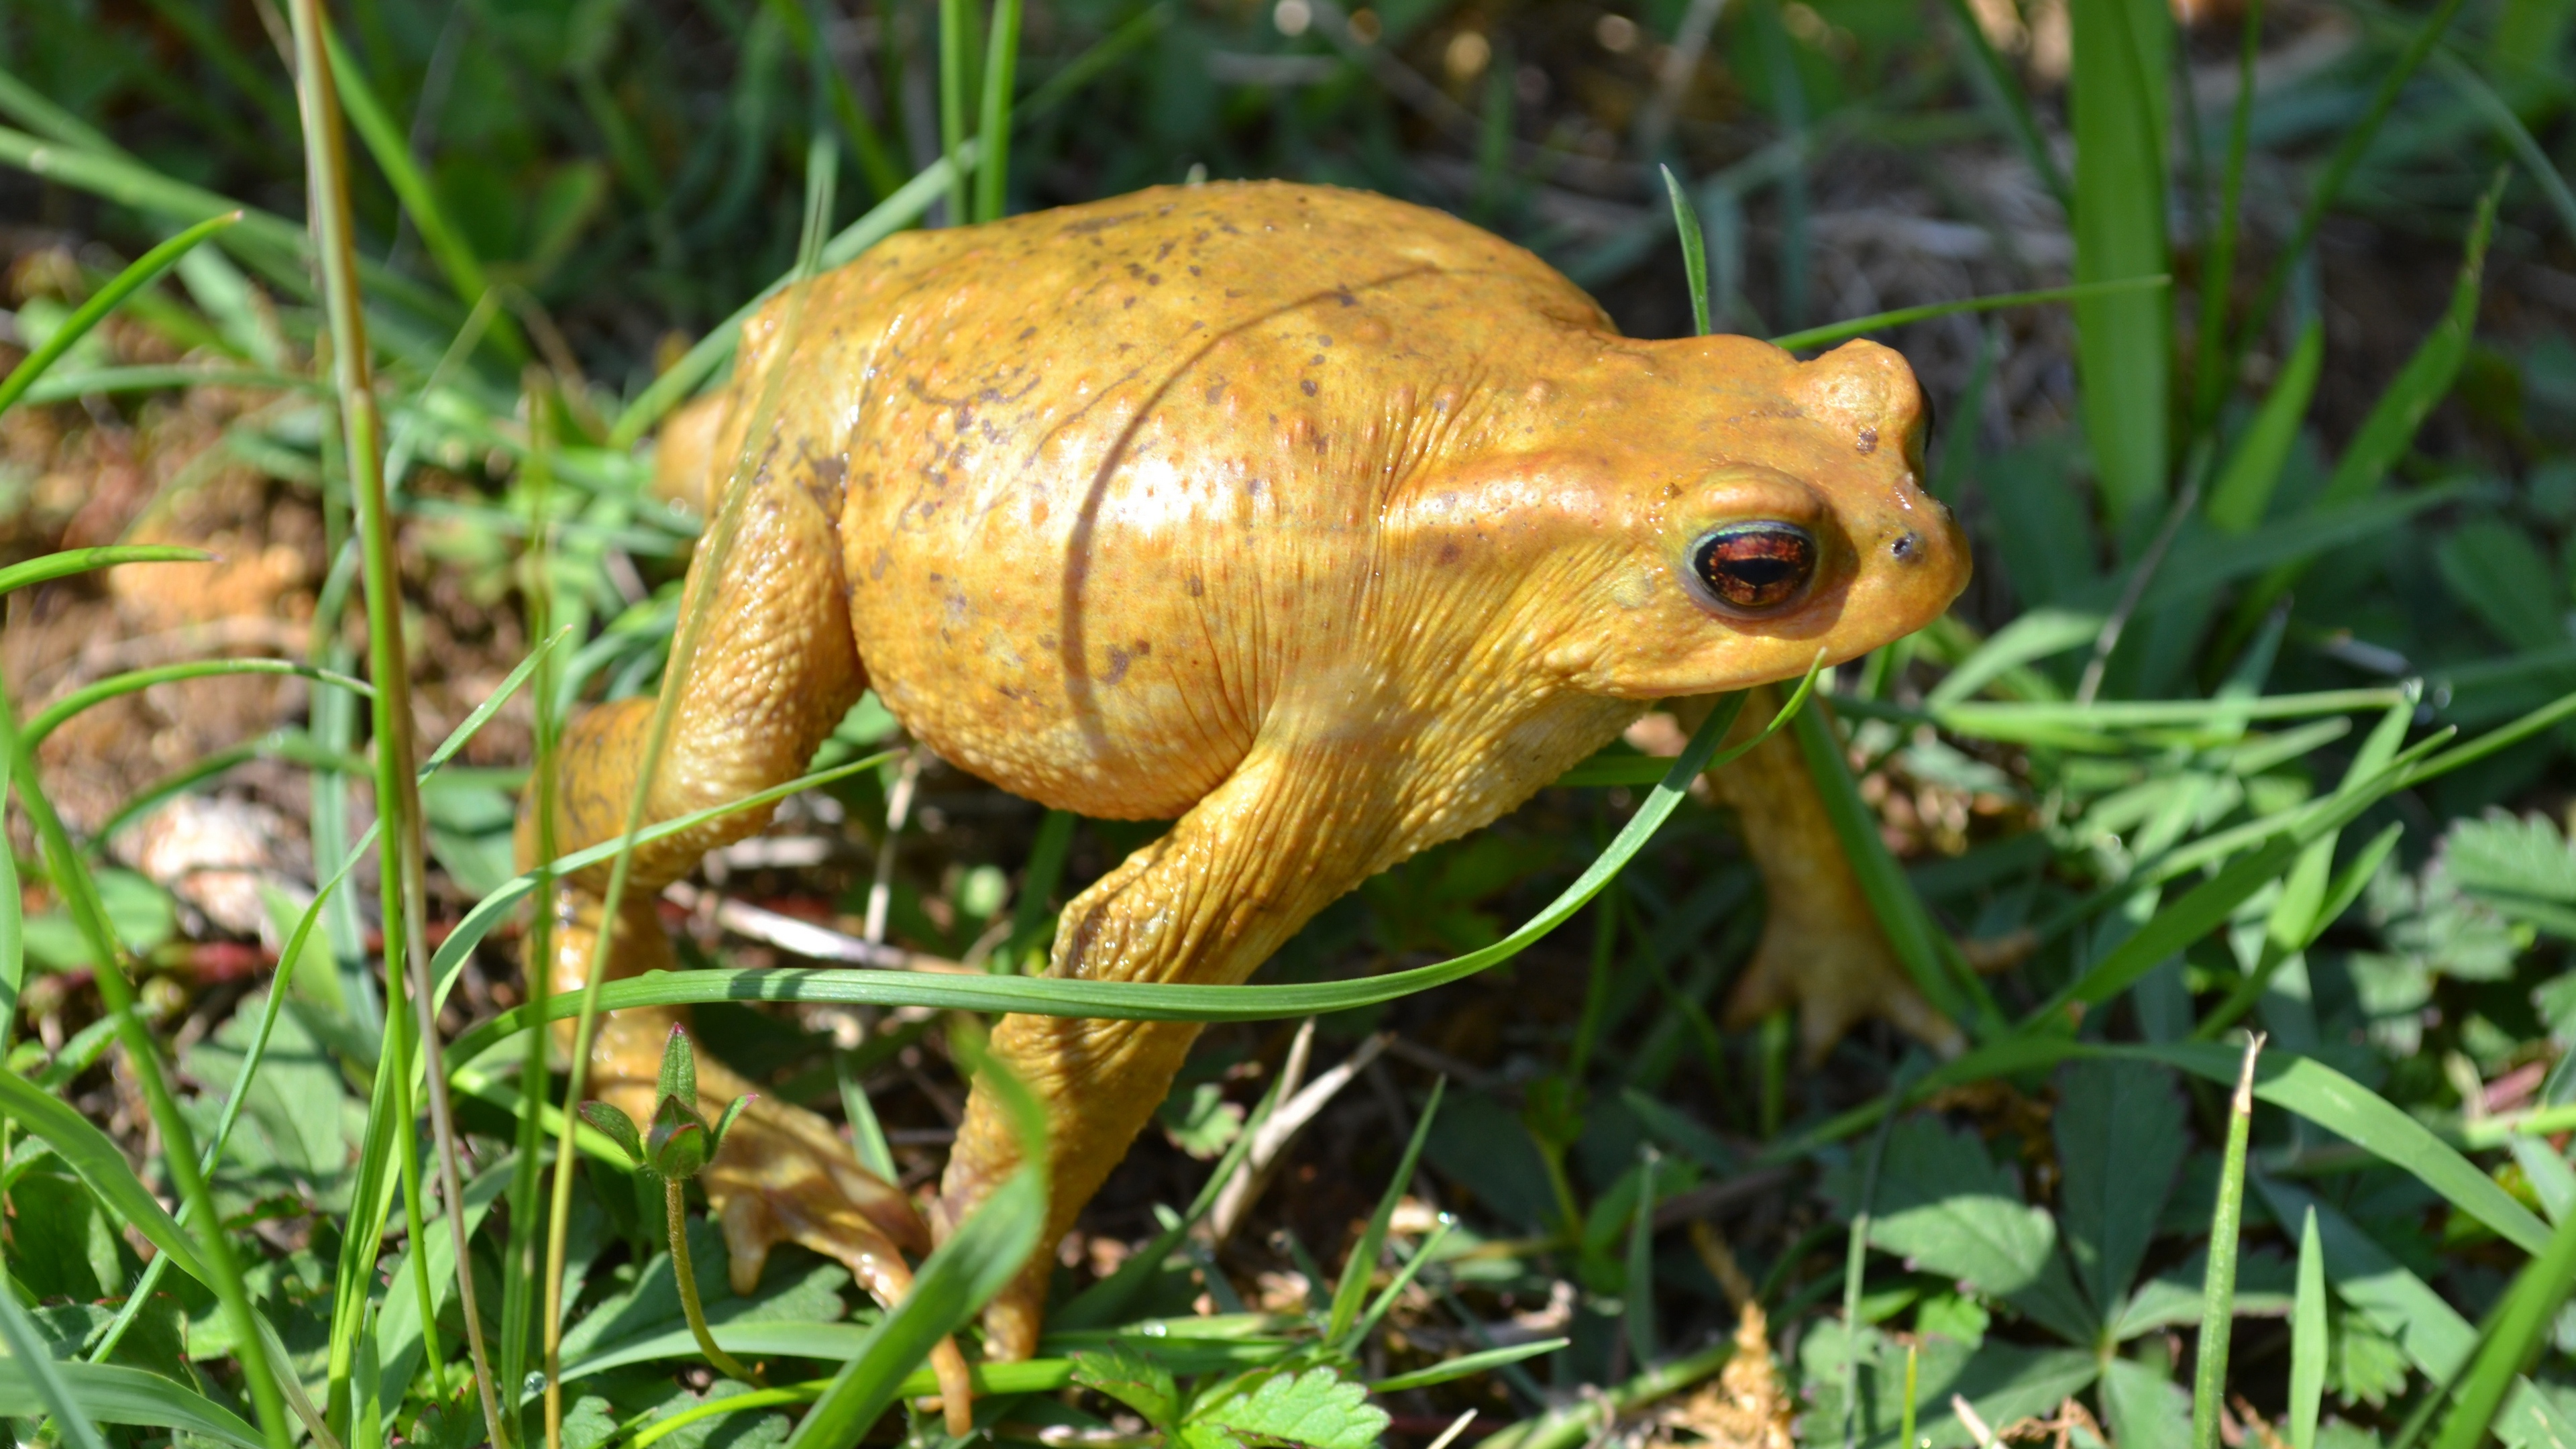 toad amphibian frog grass 4k 1542242924 - toad, amphibian, frog, grass 4k - toad, Frog, amphibian